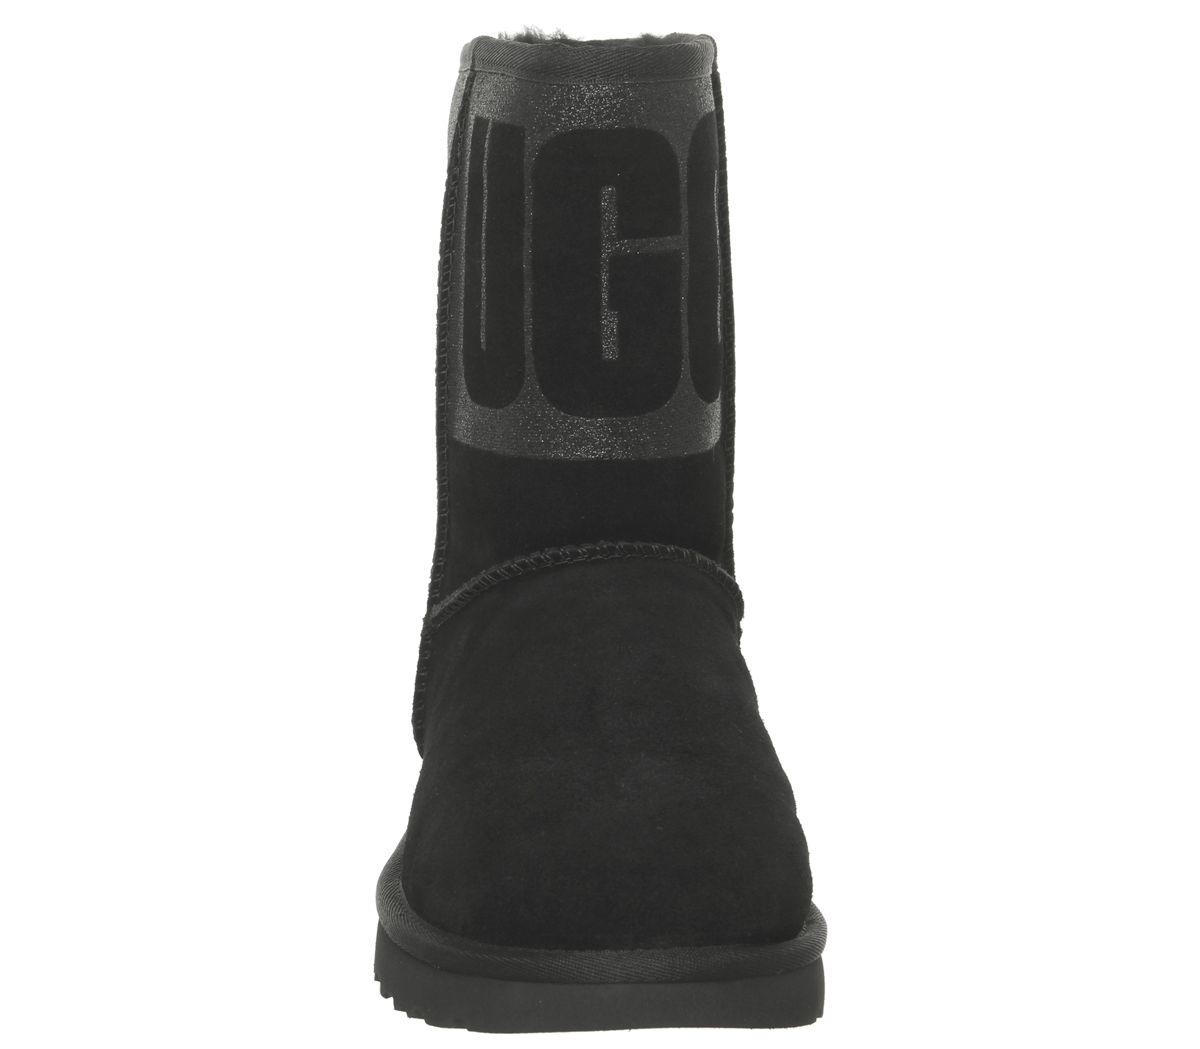 fd9acbc0c2e Classic Short Ugg Rubber Boots